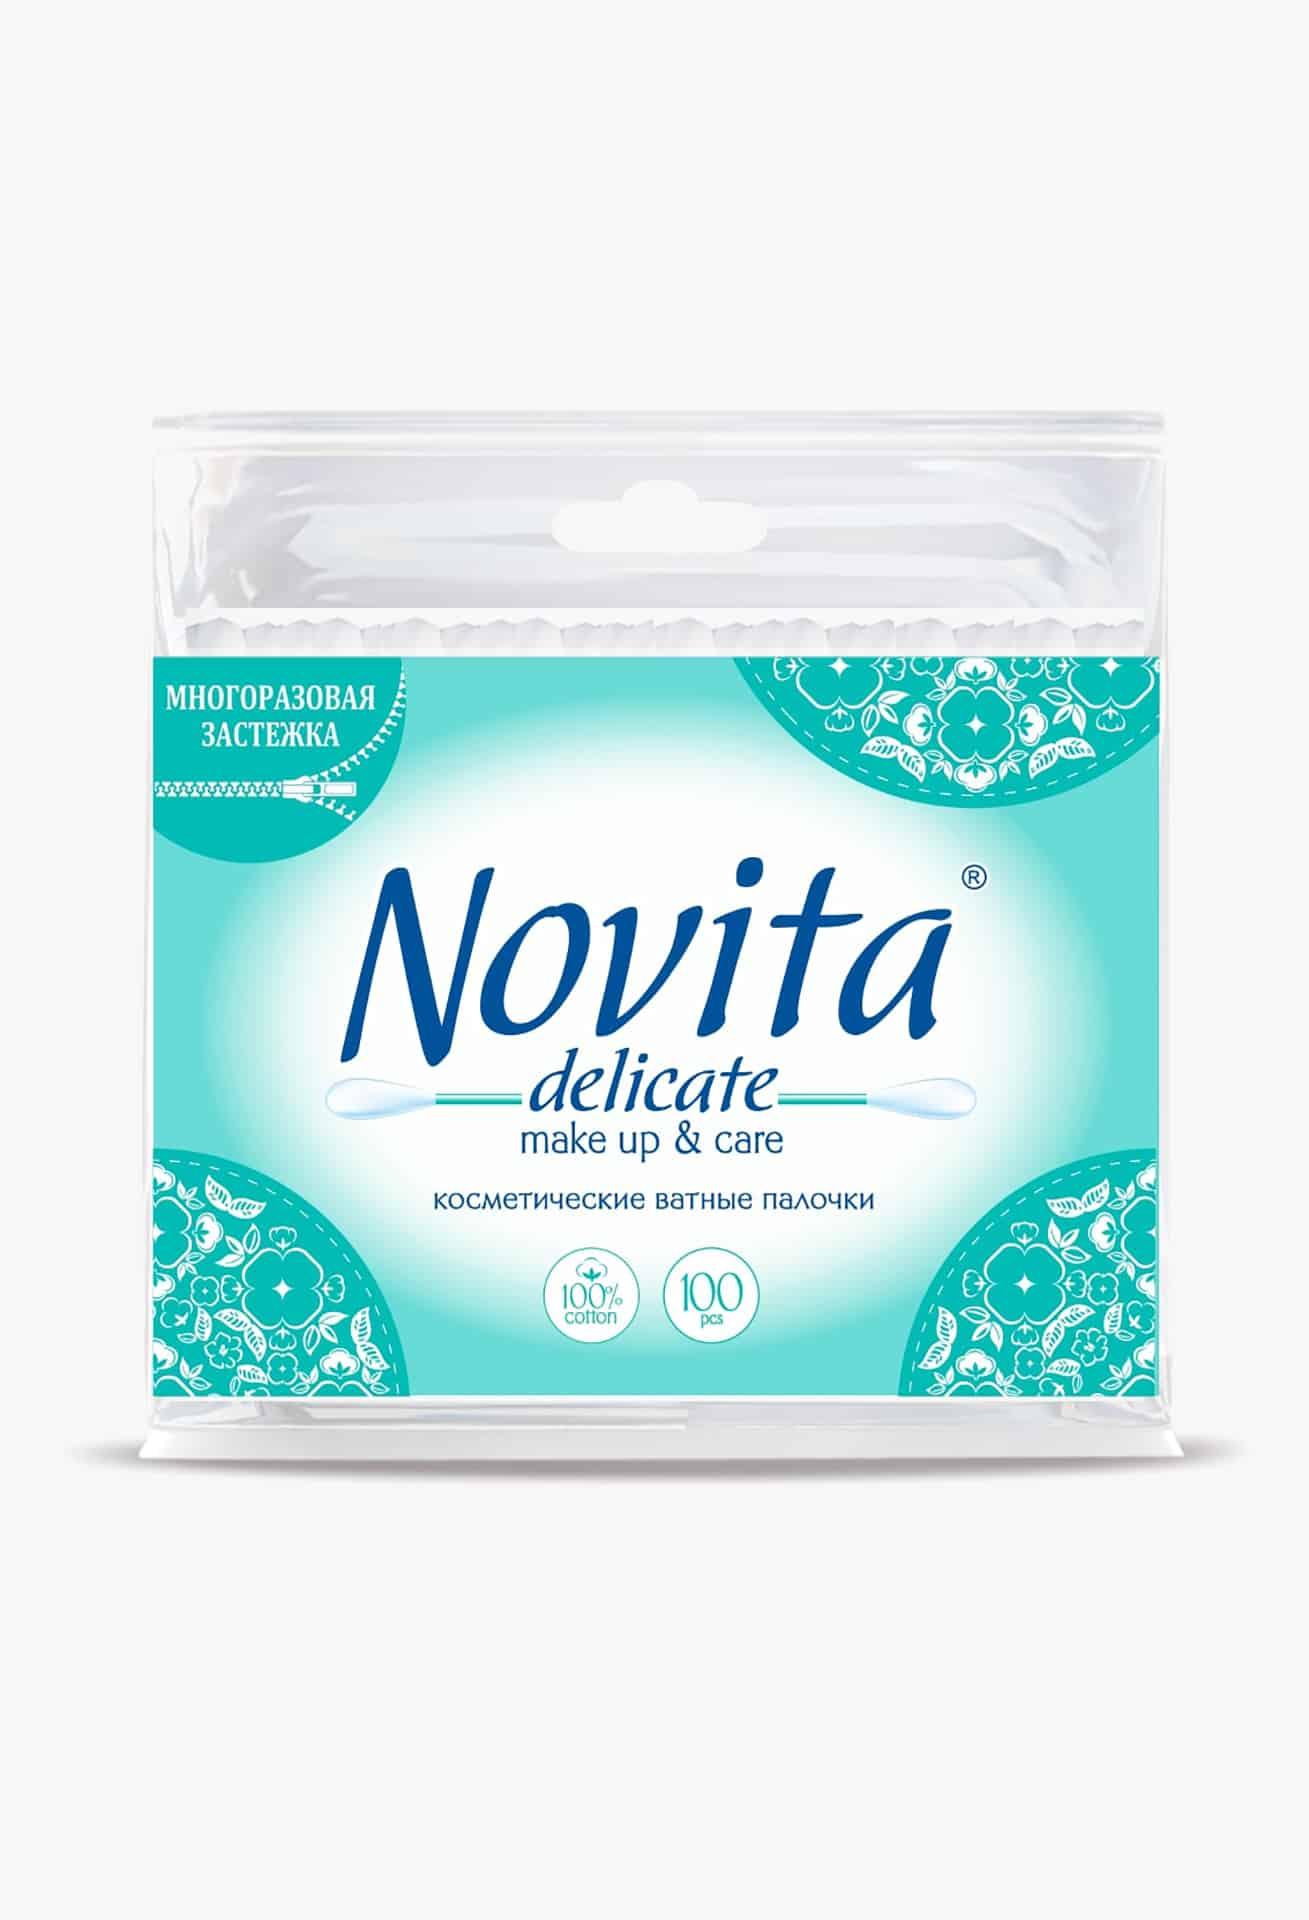 NOVITA Delicate Палички ватні в поліетиленовому пакеті, 100шт.